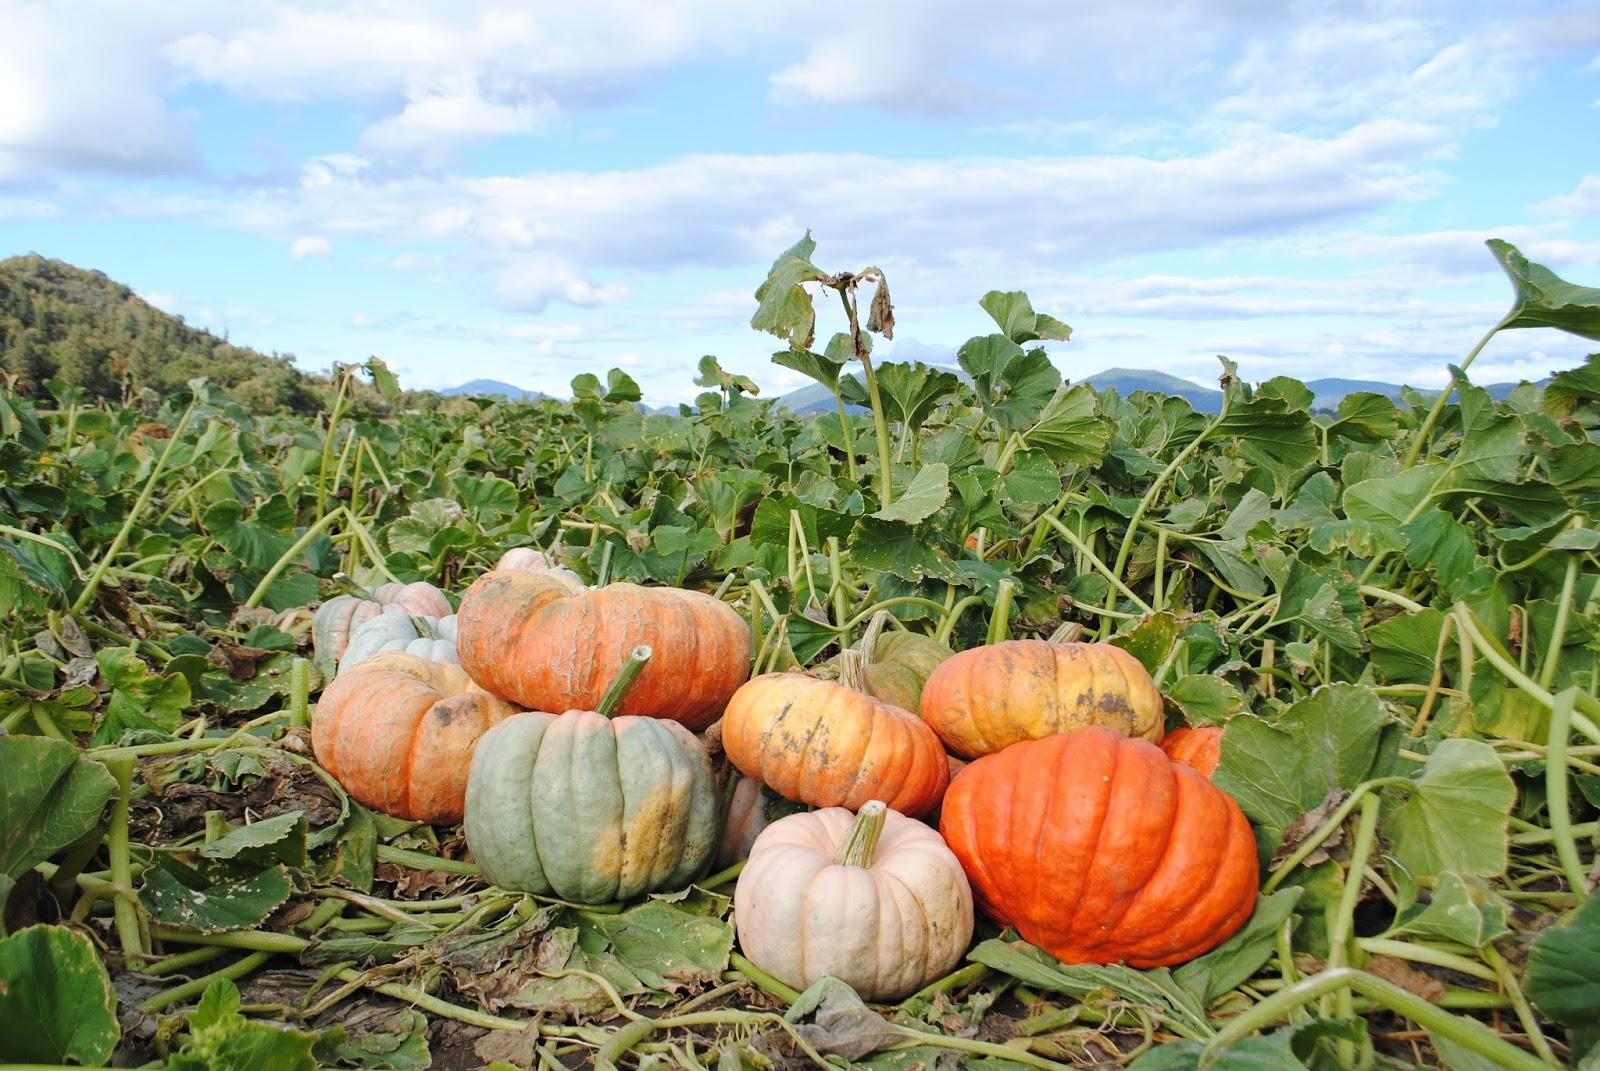 Fort Vannoy Farms Harvest Festival - Grants Pass, Oregon - Josephine County - Rogue Valley - Southern Oregon - Fall - Autumn - Pumpkin Patch - Corn Maze - Hayrides (223).JPG